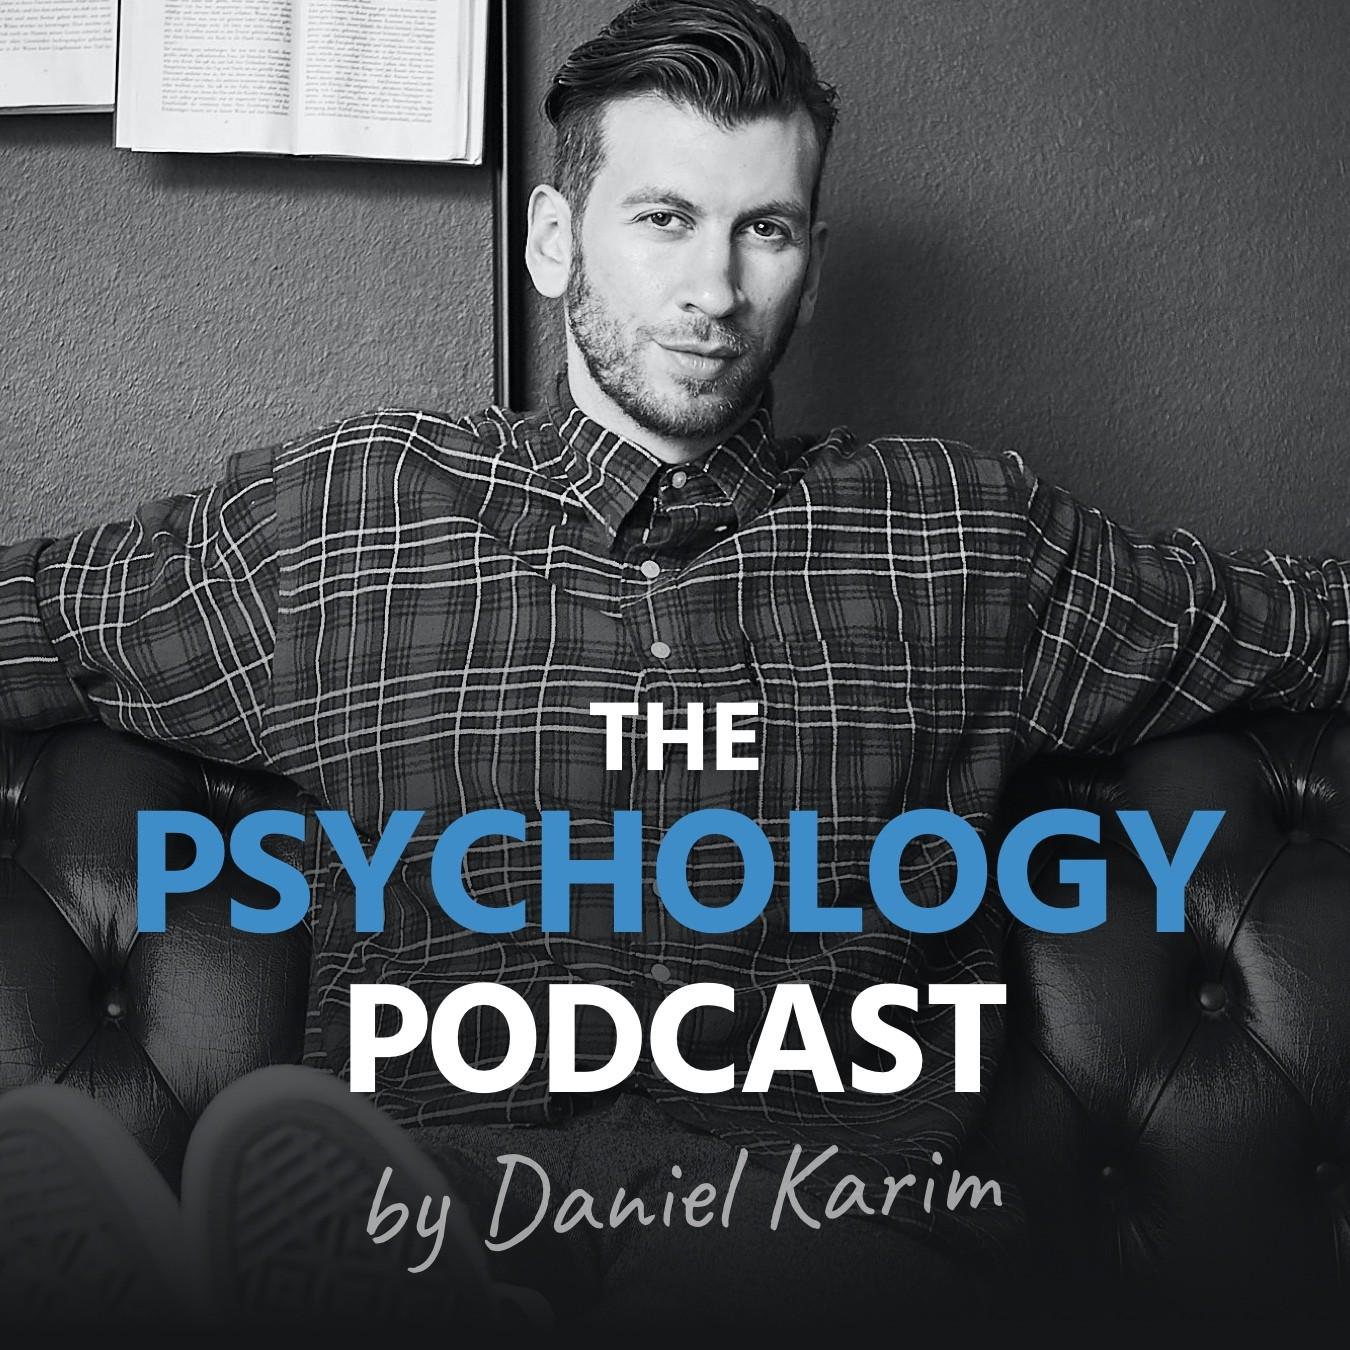 The Psychology Podcast by Daniel Karim